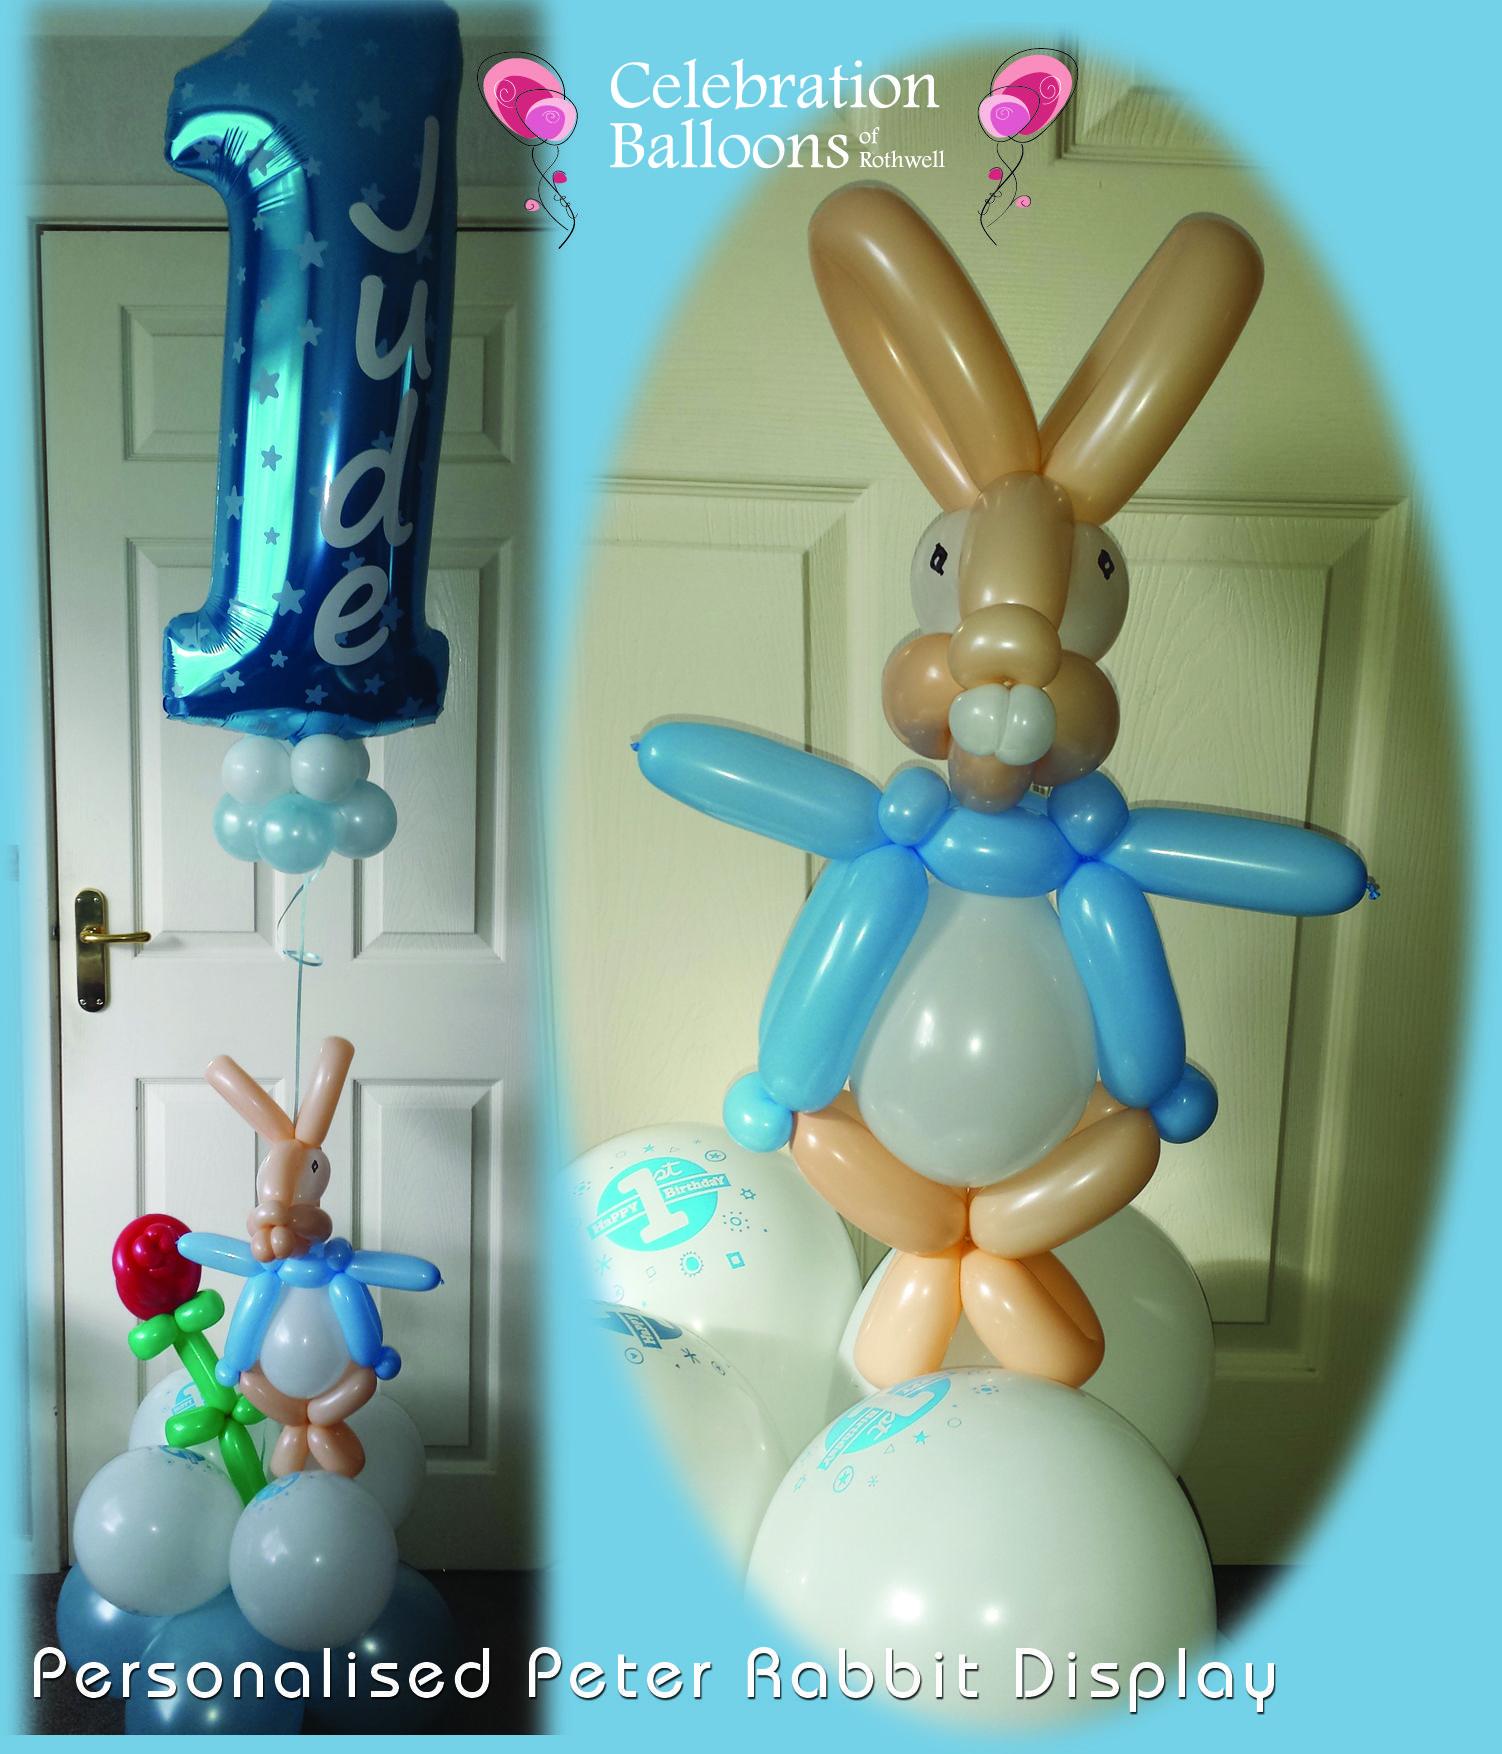 Peter Rabbit balloon Peter Rabbit Balloons Peter Rabbit Party